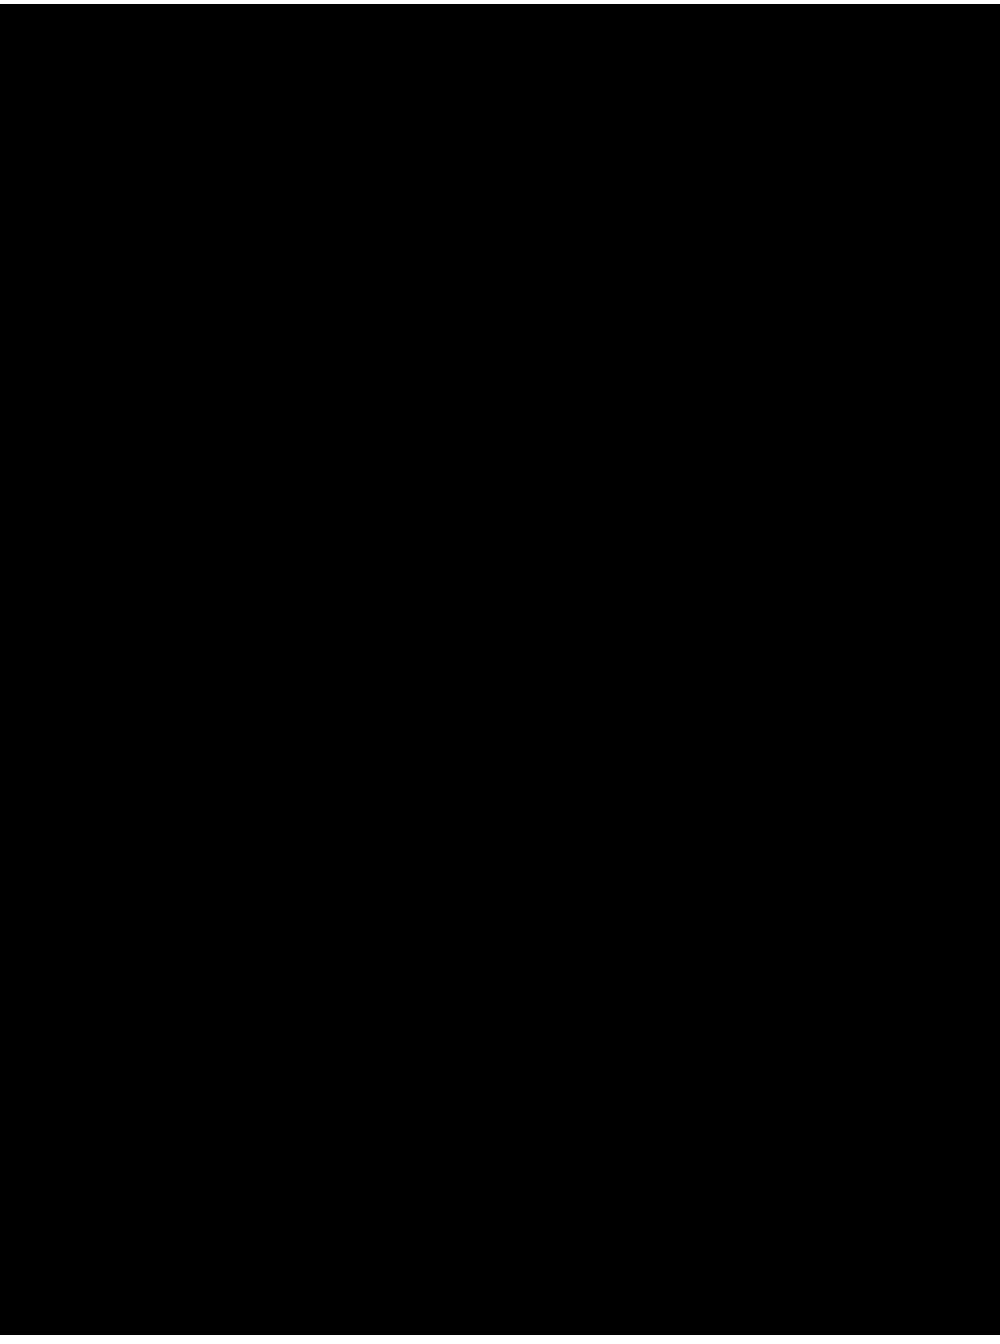 A linocut illustration of a black crow